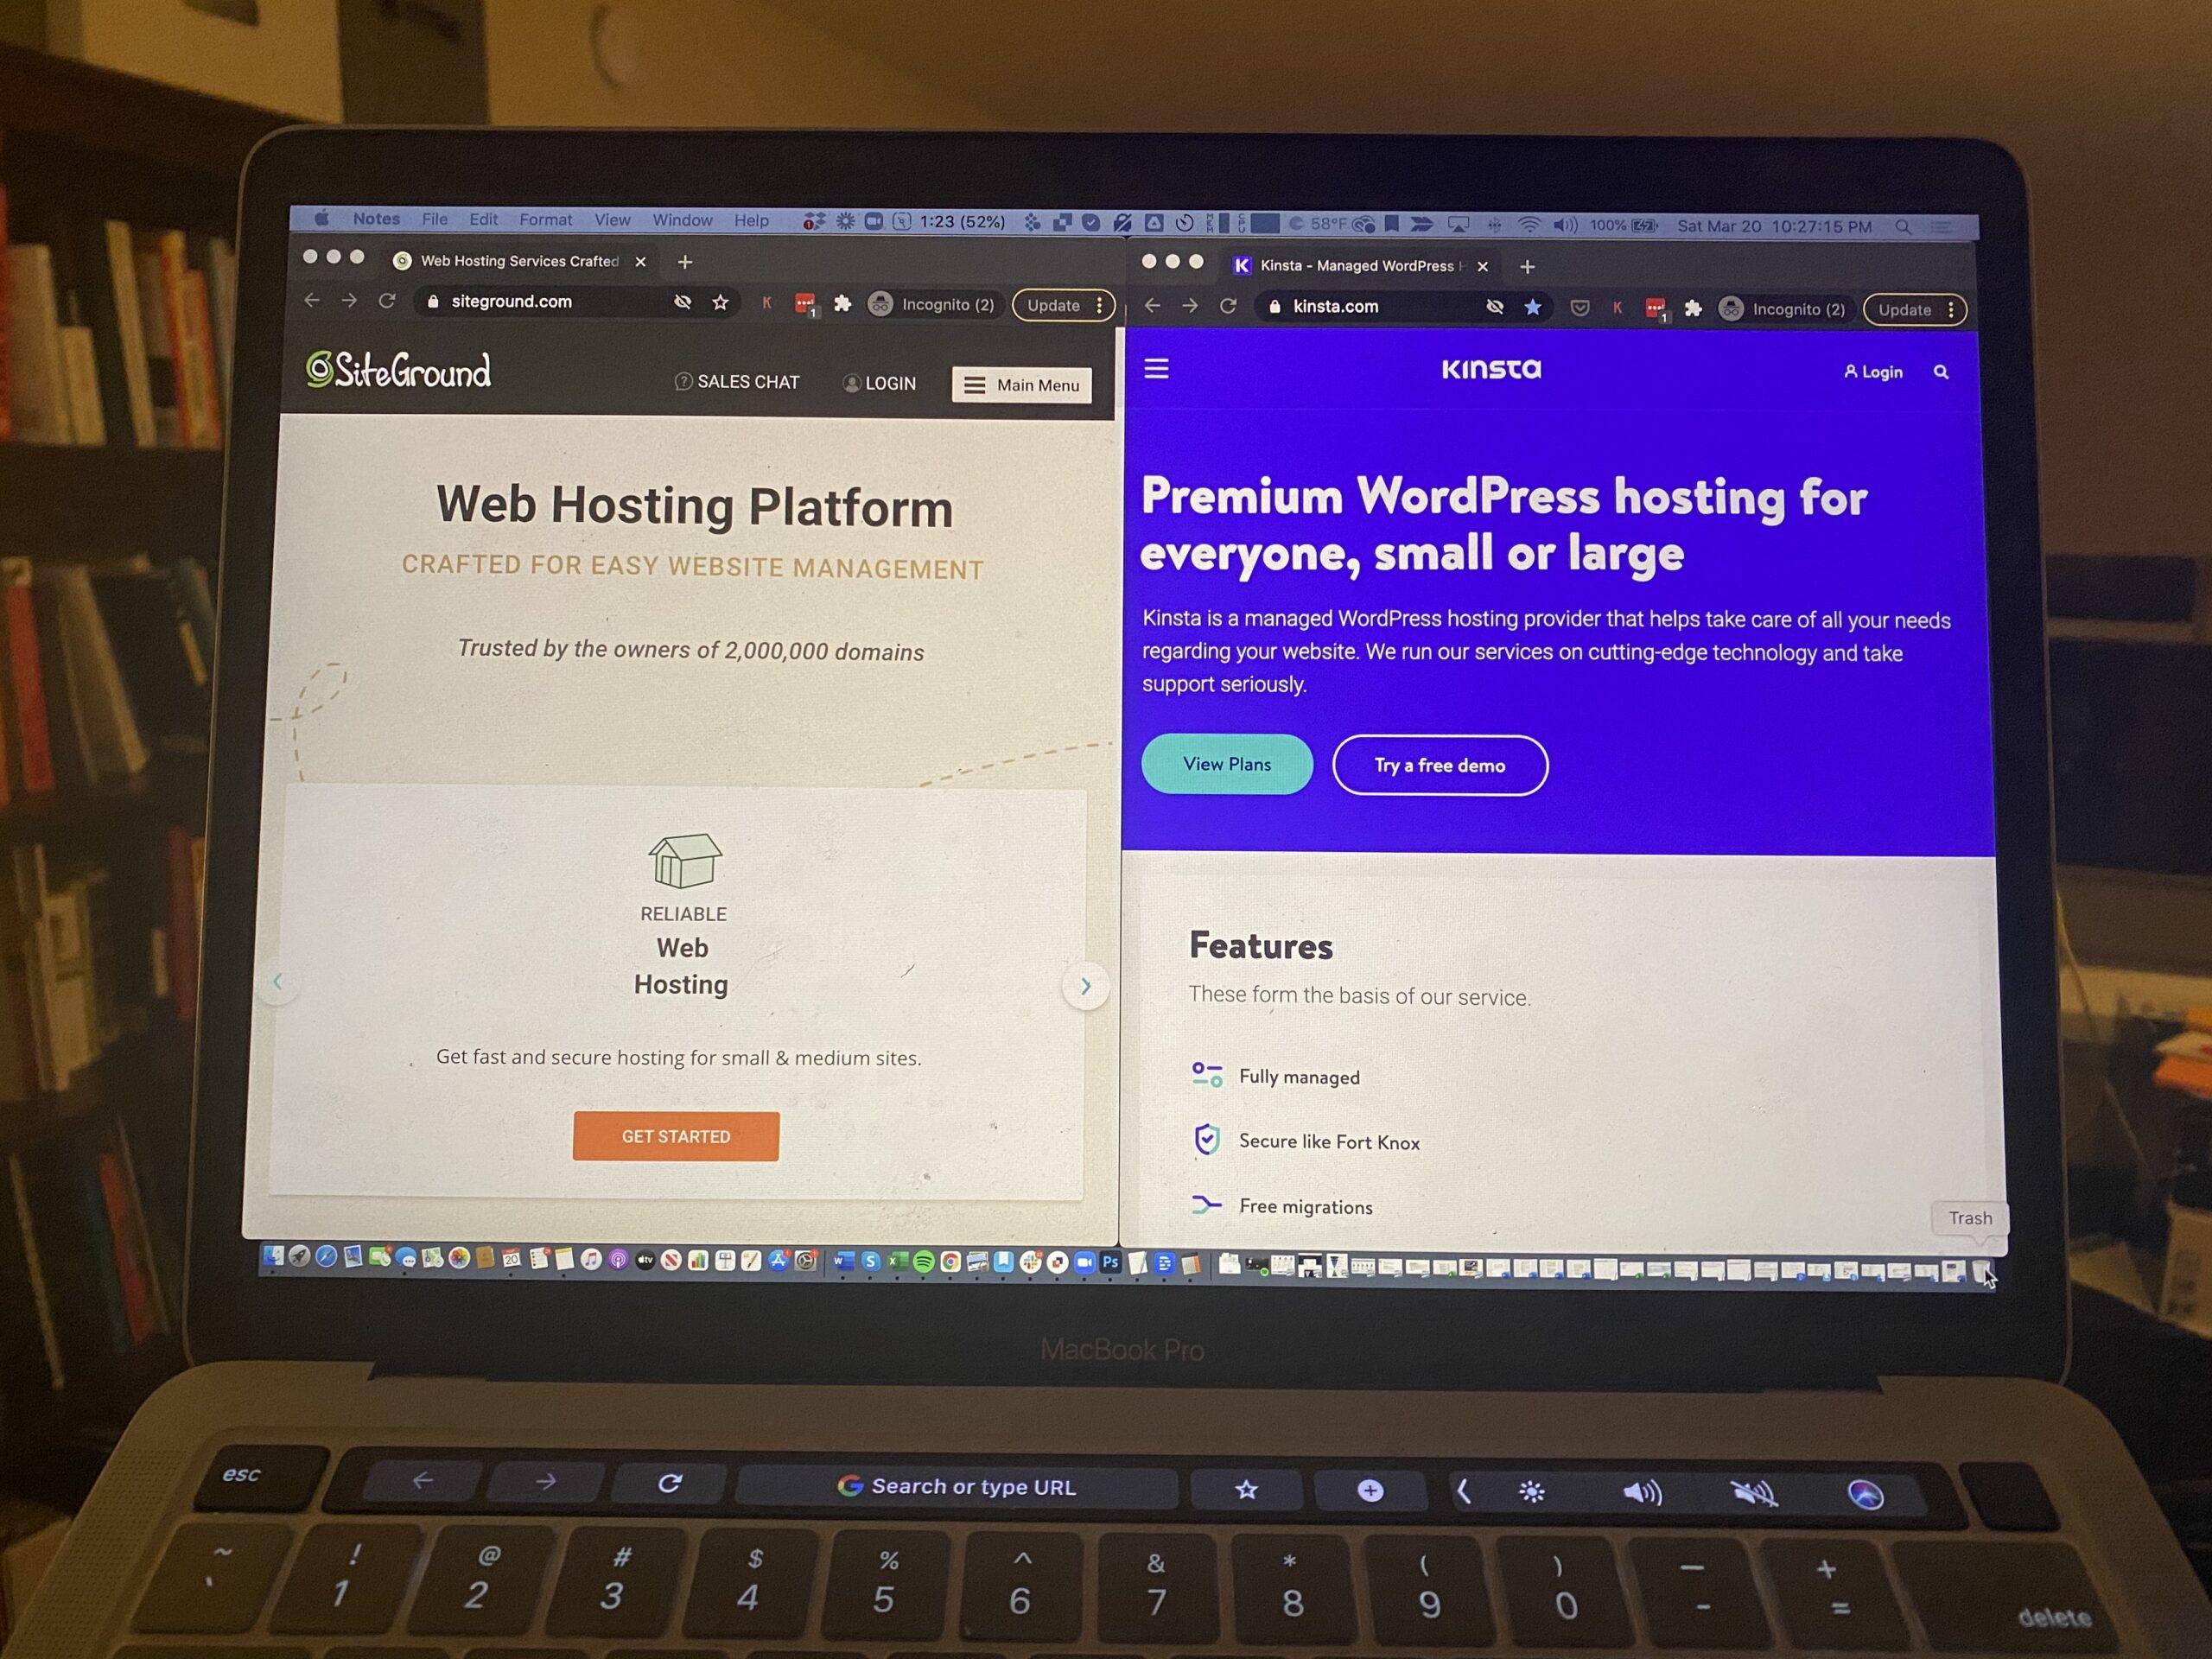 kinsta vs siteground on laptop screen